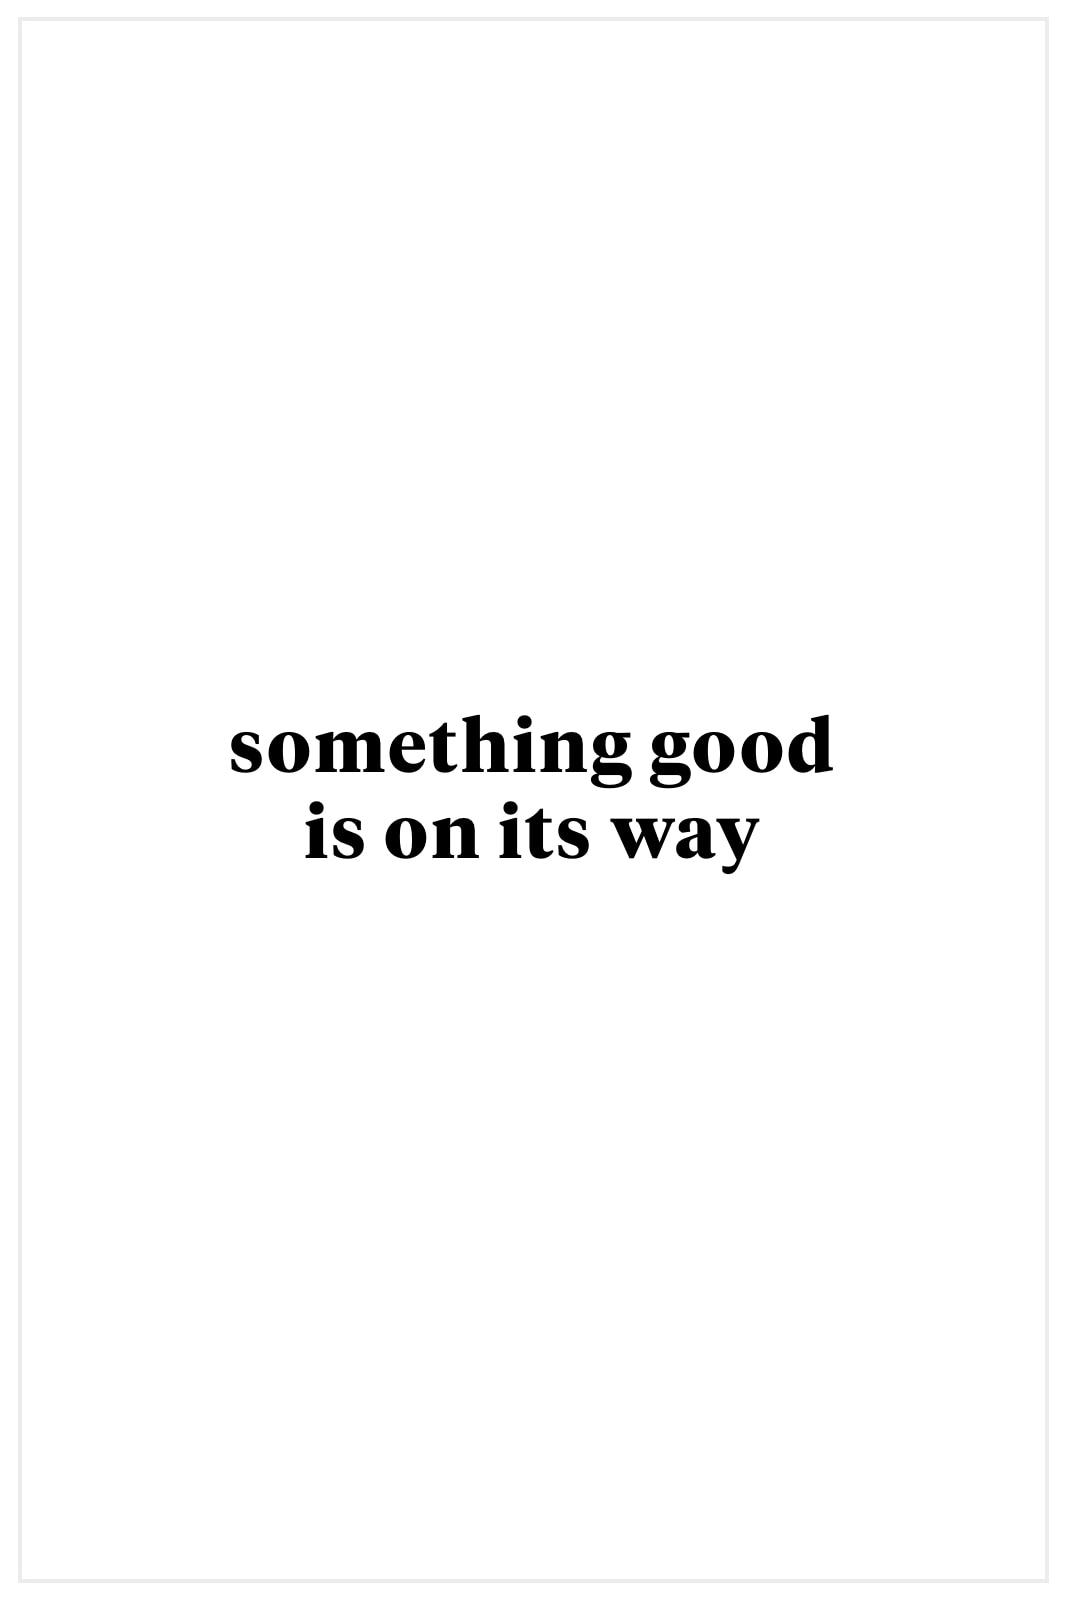 Harriet isles Sutton Packable Straw Hat